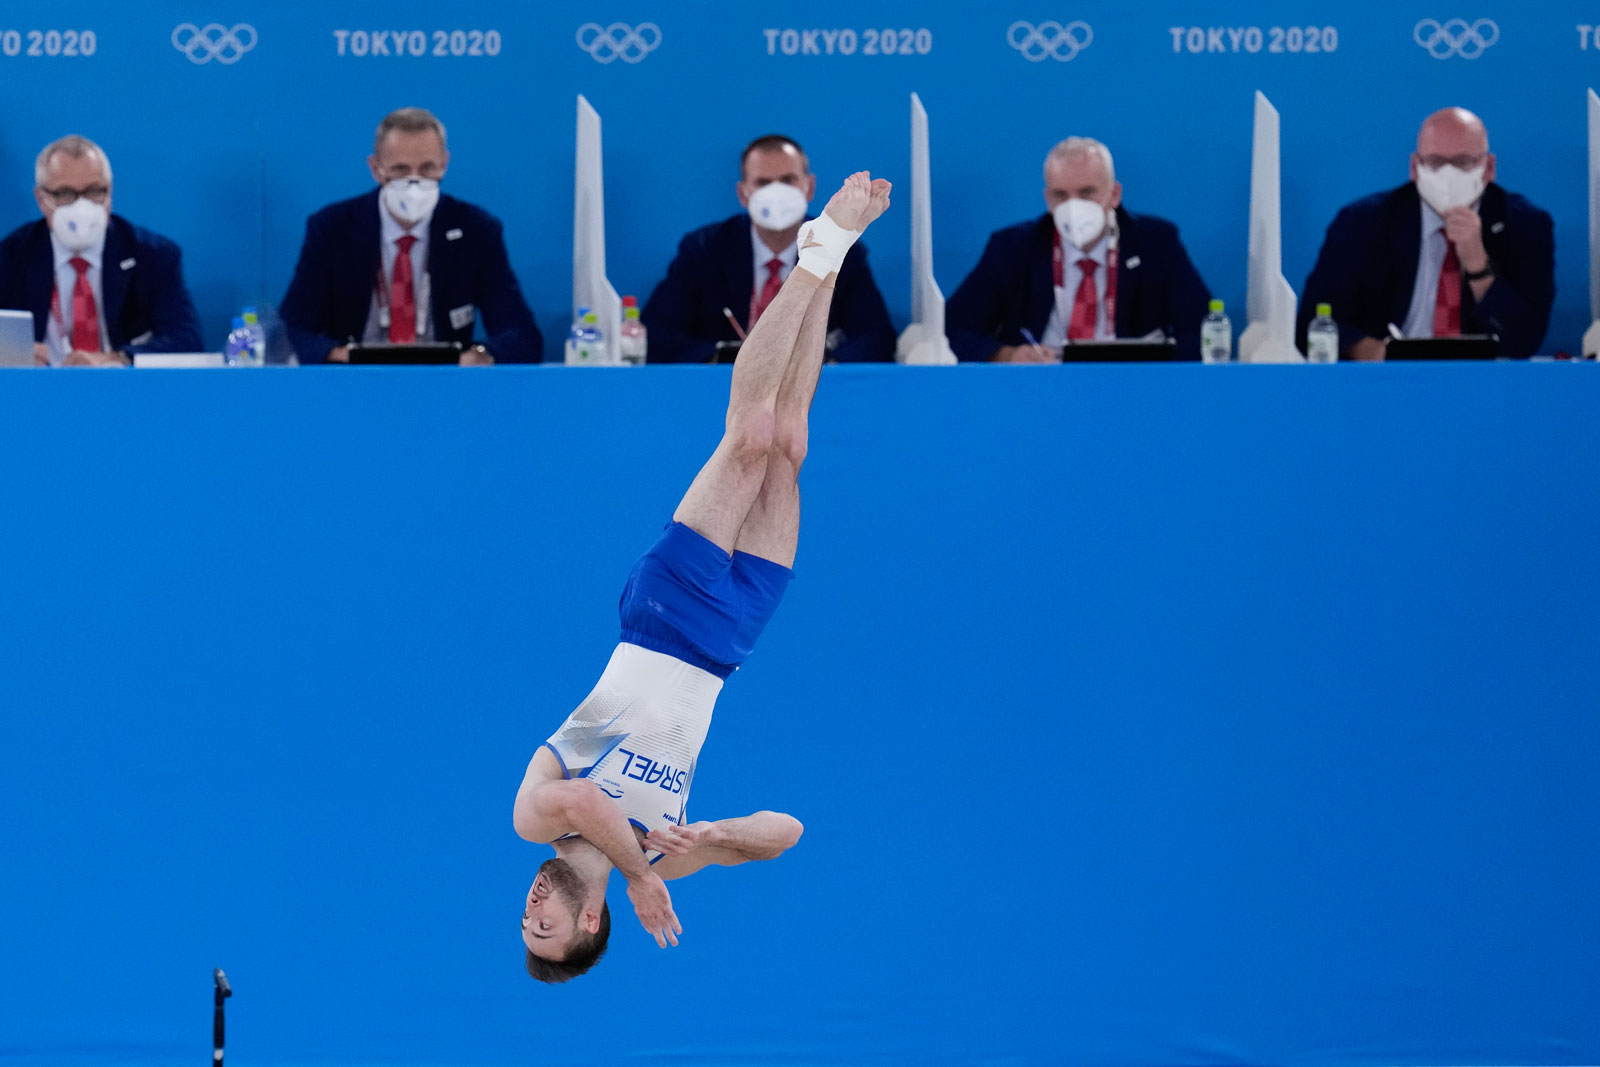 Artem Dolgopyat performs on the floor exercise during the artistic gymnastics men's apparatus final.